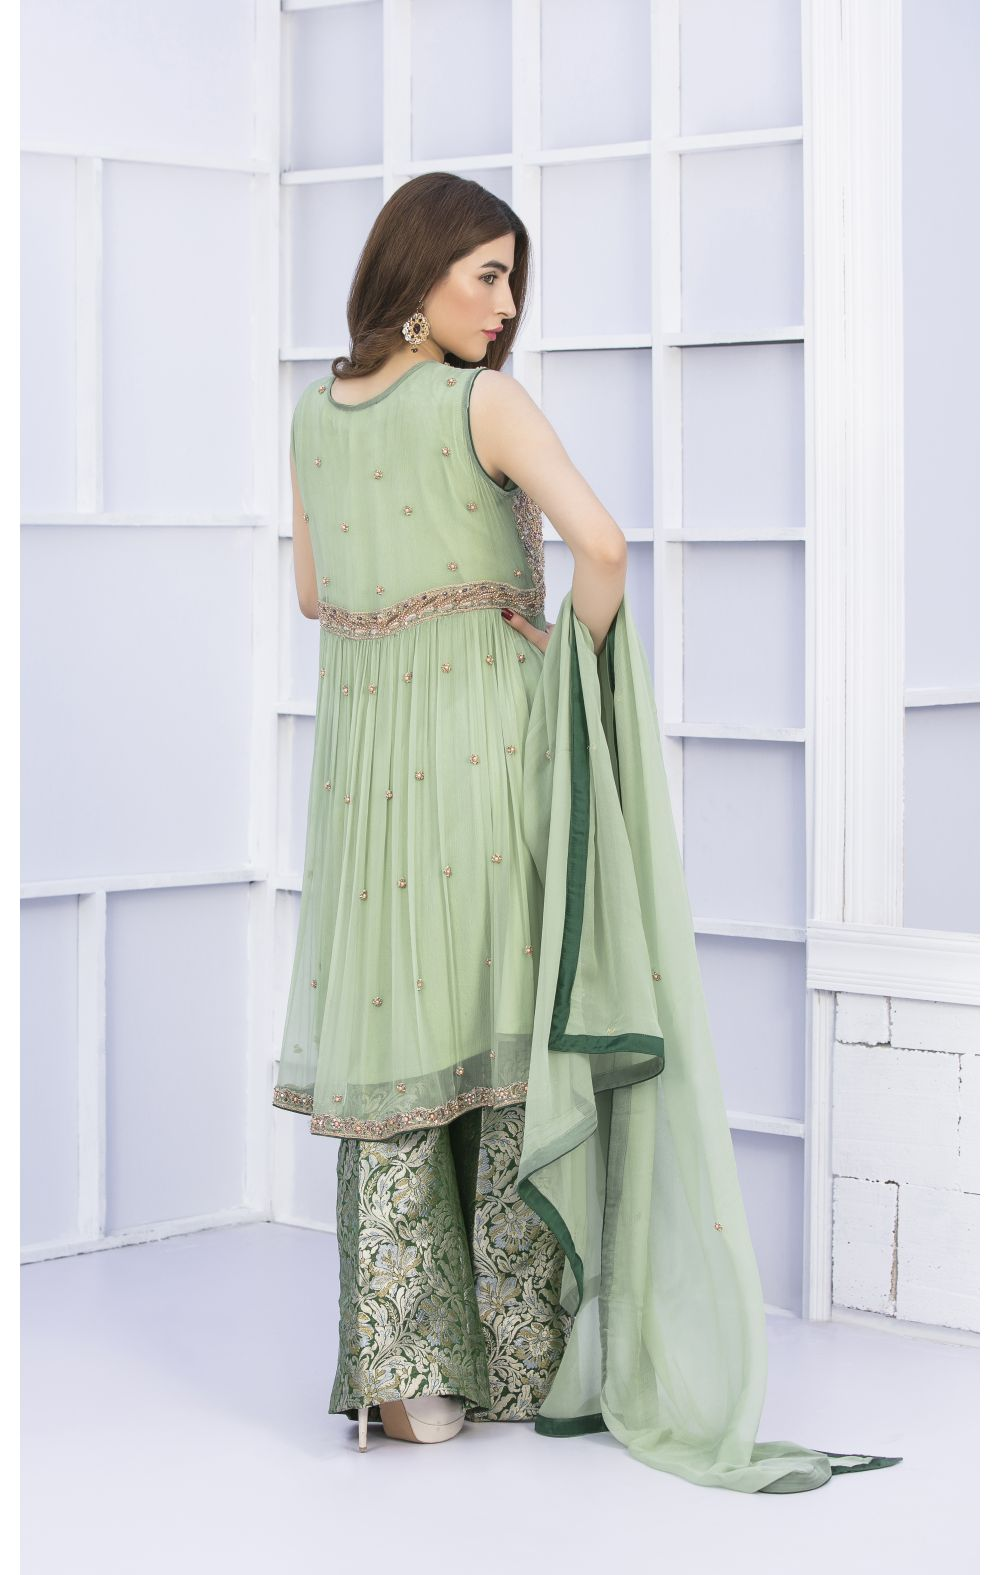 Buy Exclusive Pista Green And Bottle Green Bridal Wear – G15127 Online In USA, Uk & Pakistan - 01